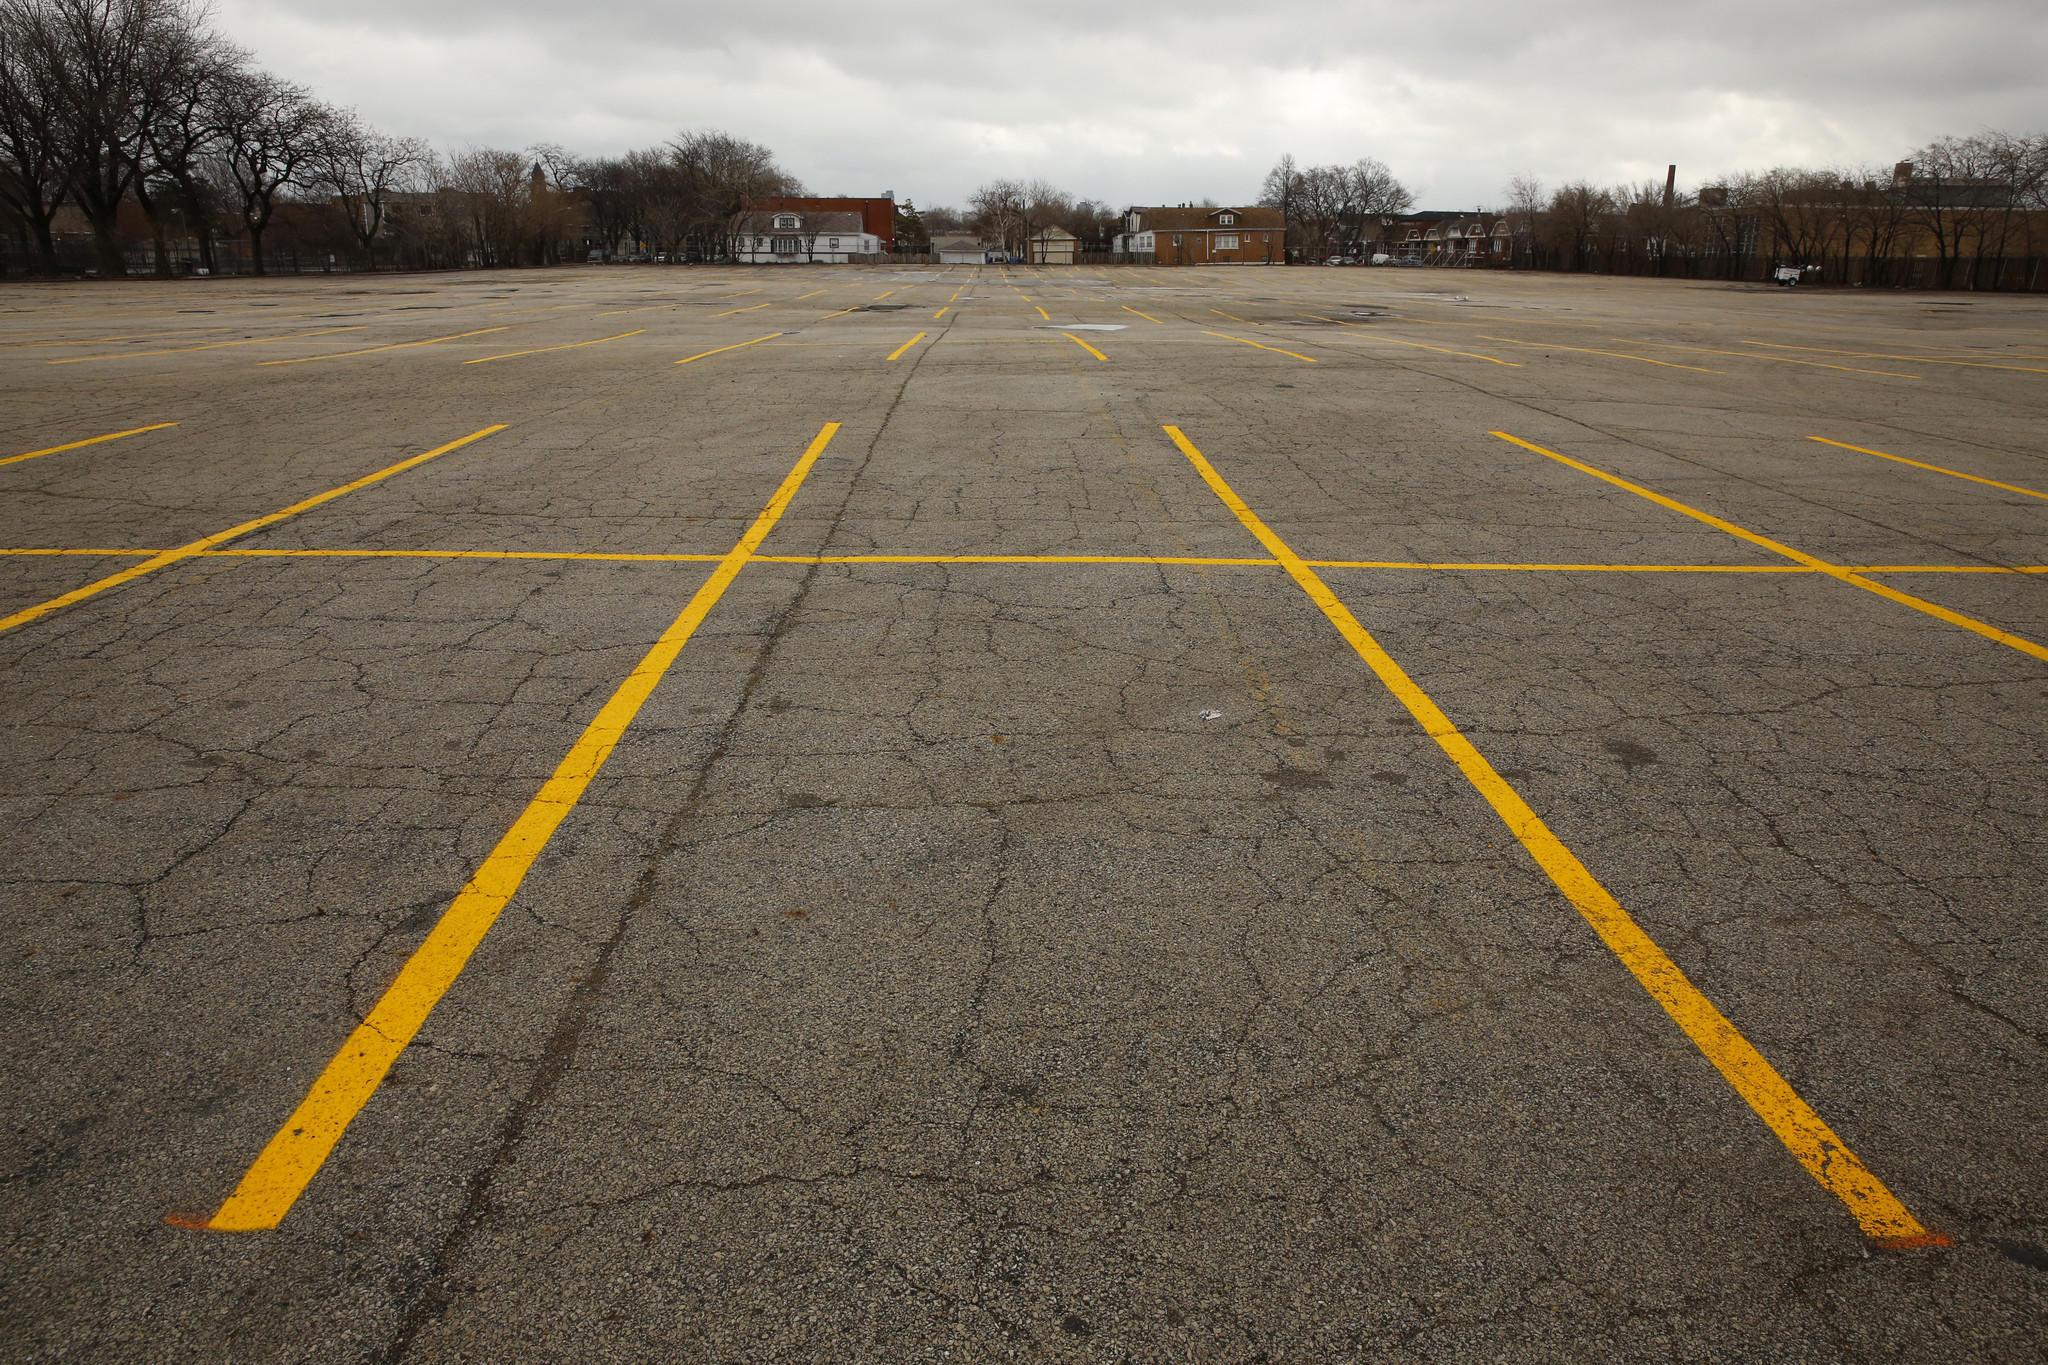 Cubs fight for remote parking lot - tribunedigital-chicagotribune